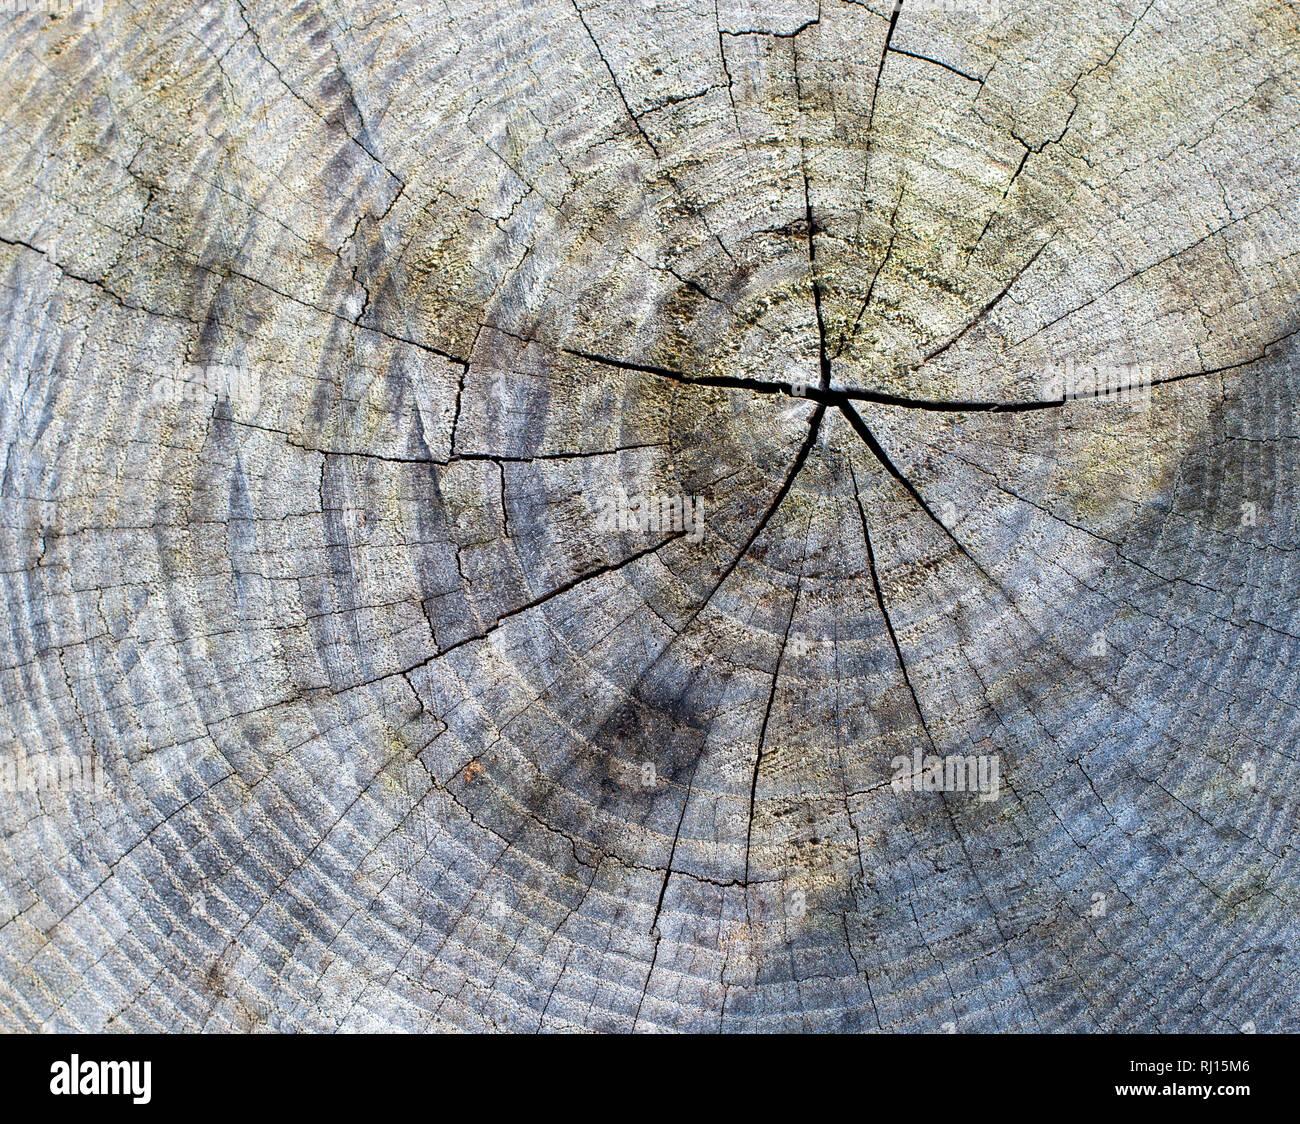 tree stub texture background - Stock Image